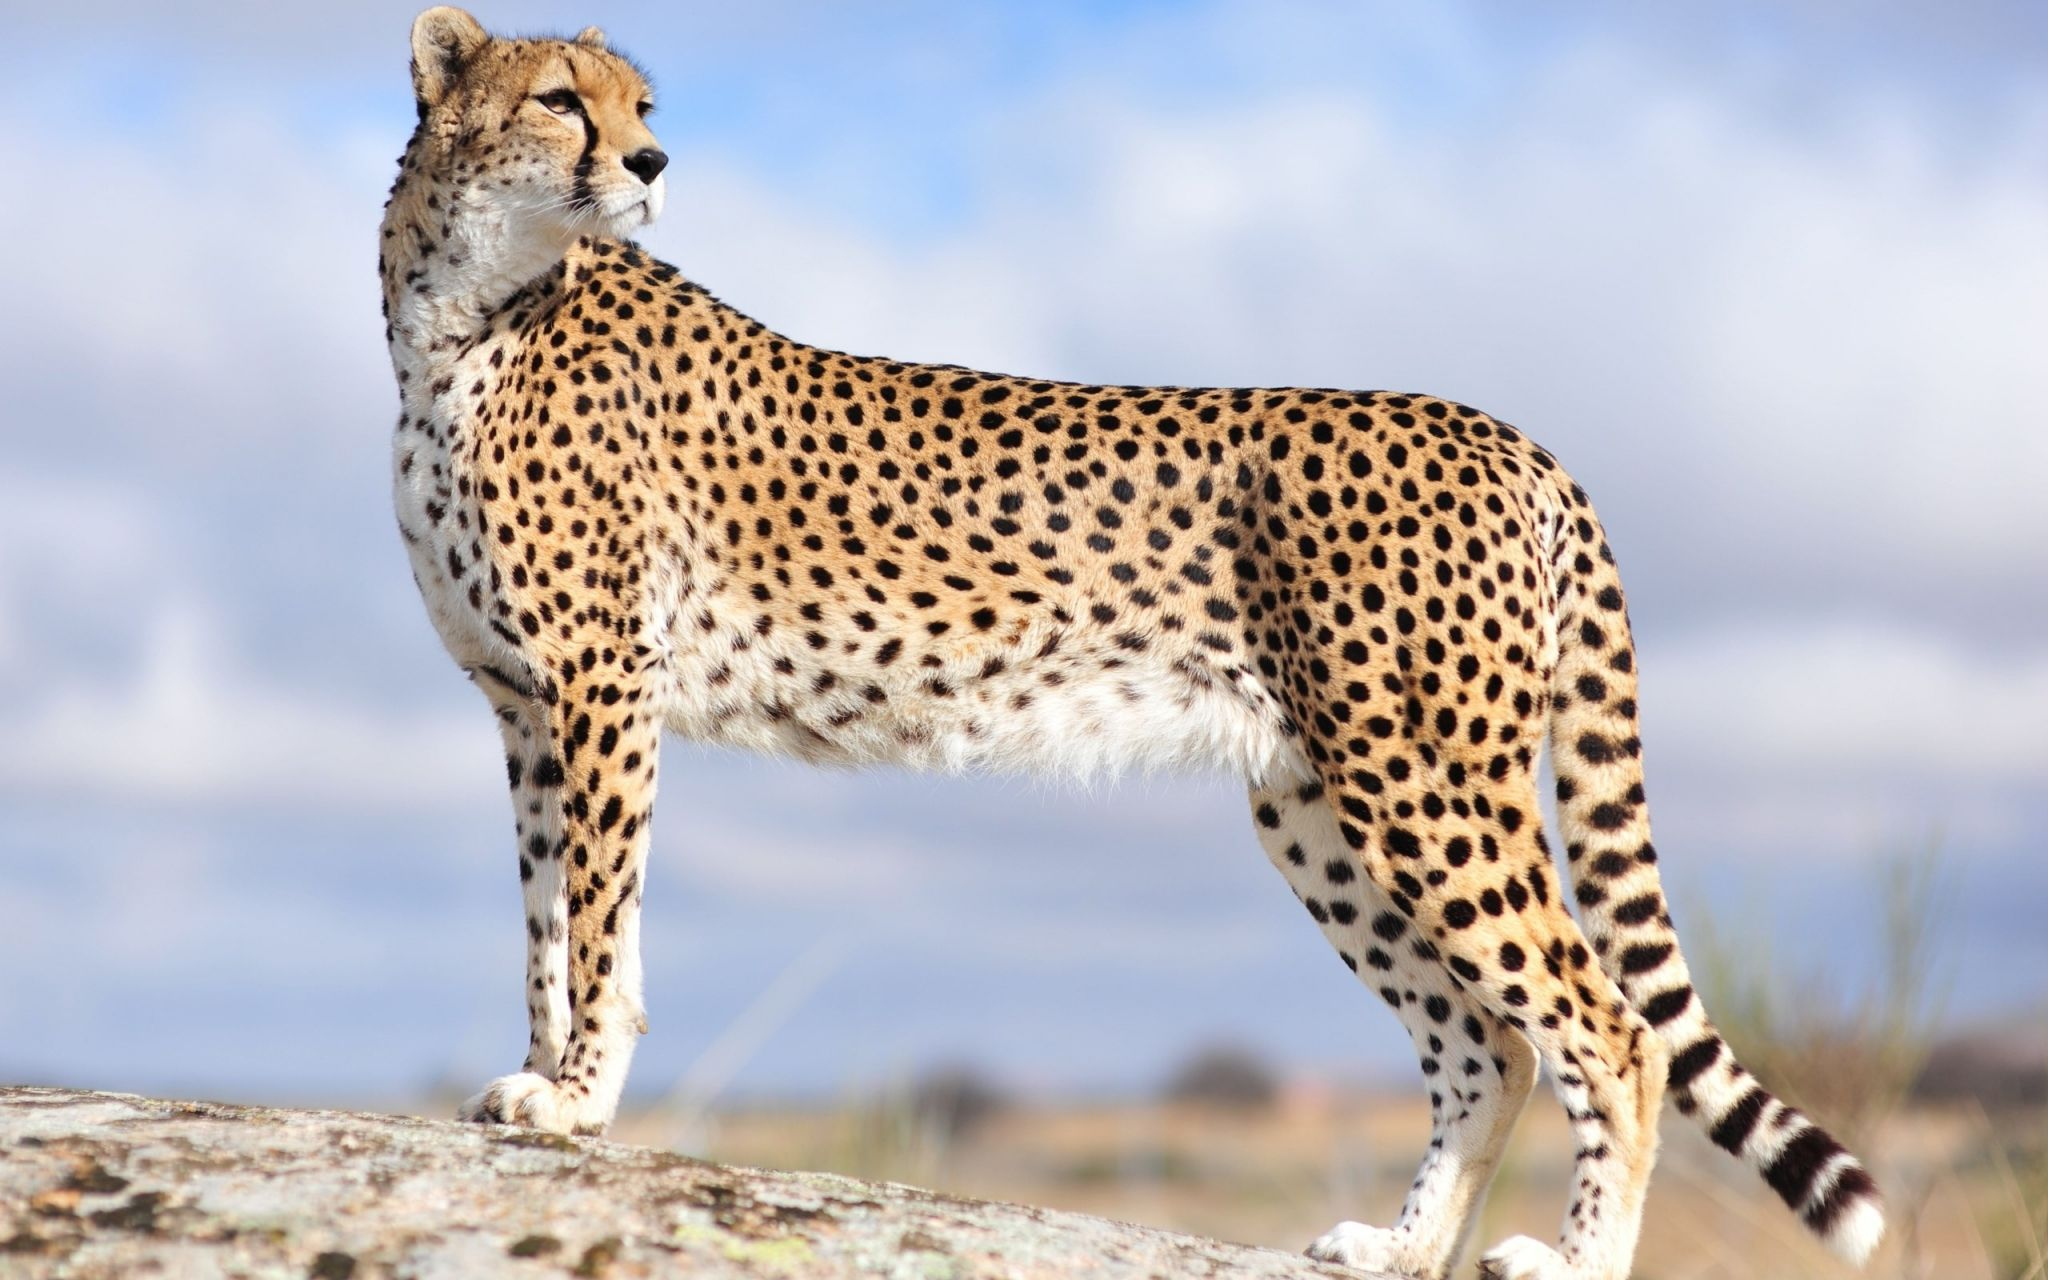 Cheetah wallpaper desktop sharovarka pinterest cheetah cheetah wallpaper desktop voltagebd Image collections